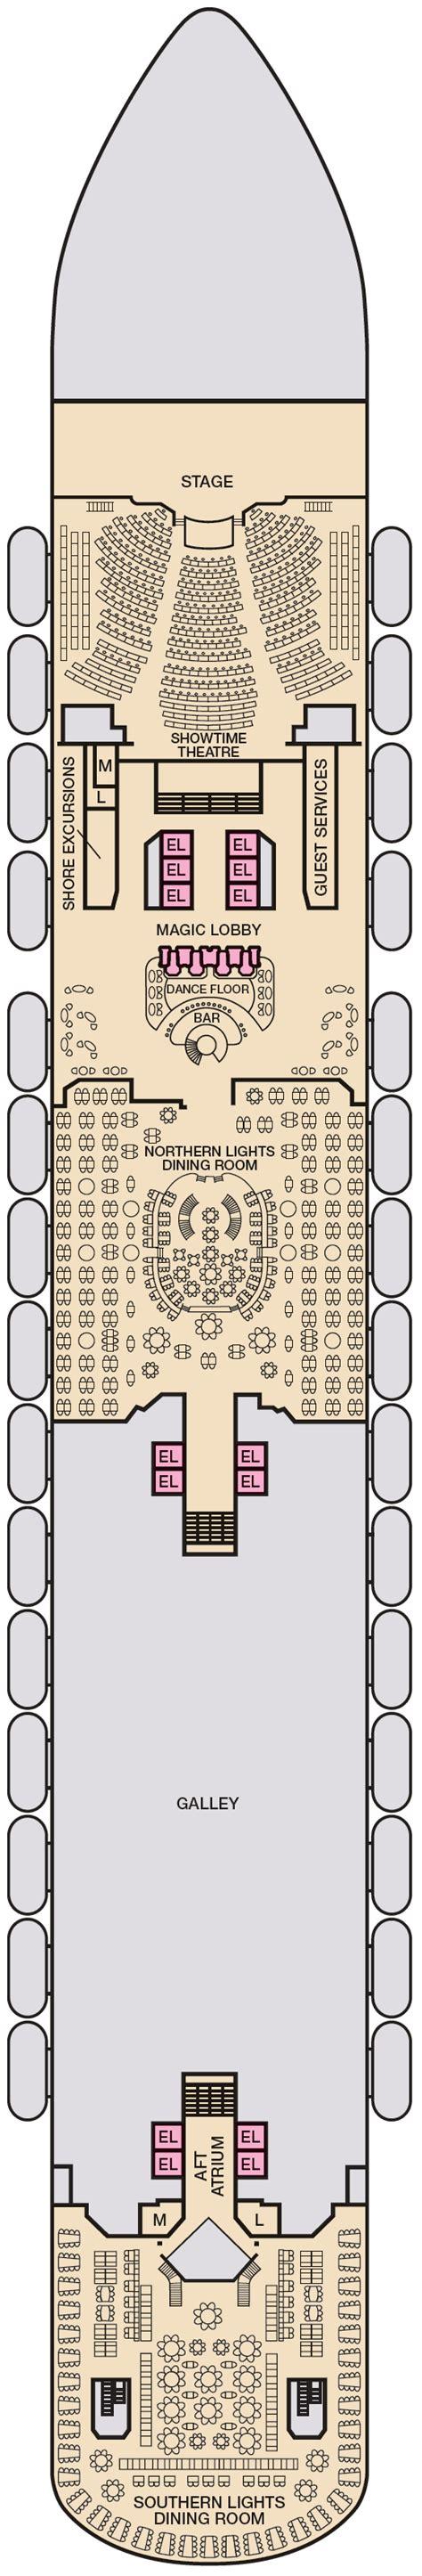 carnival magic deck 9 interior stateroom floor plans carnival magic deck plans